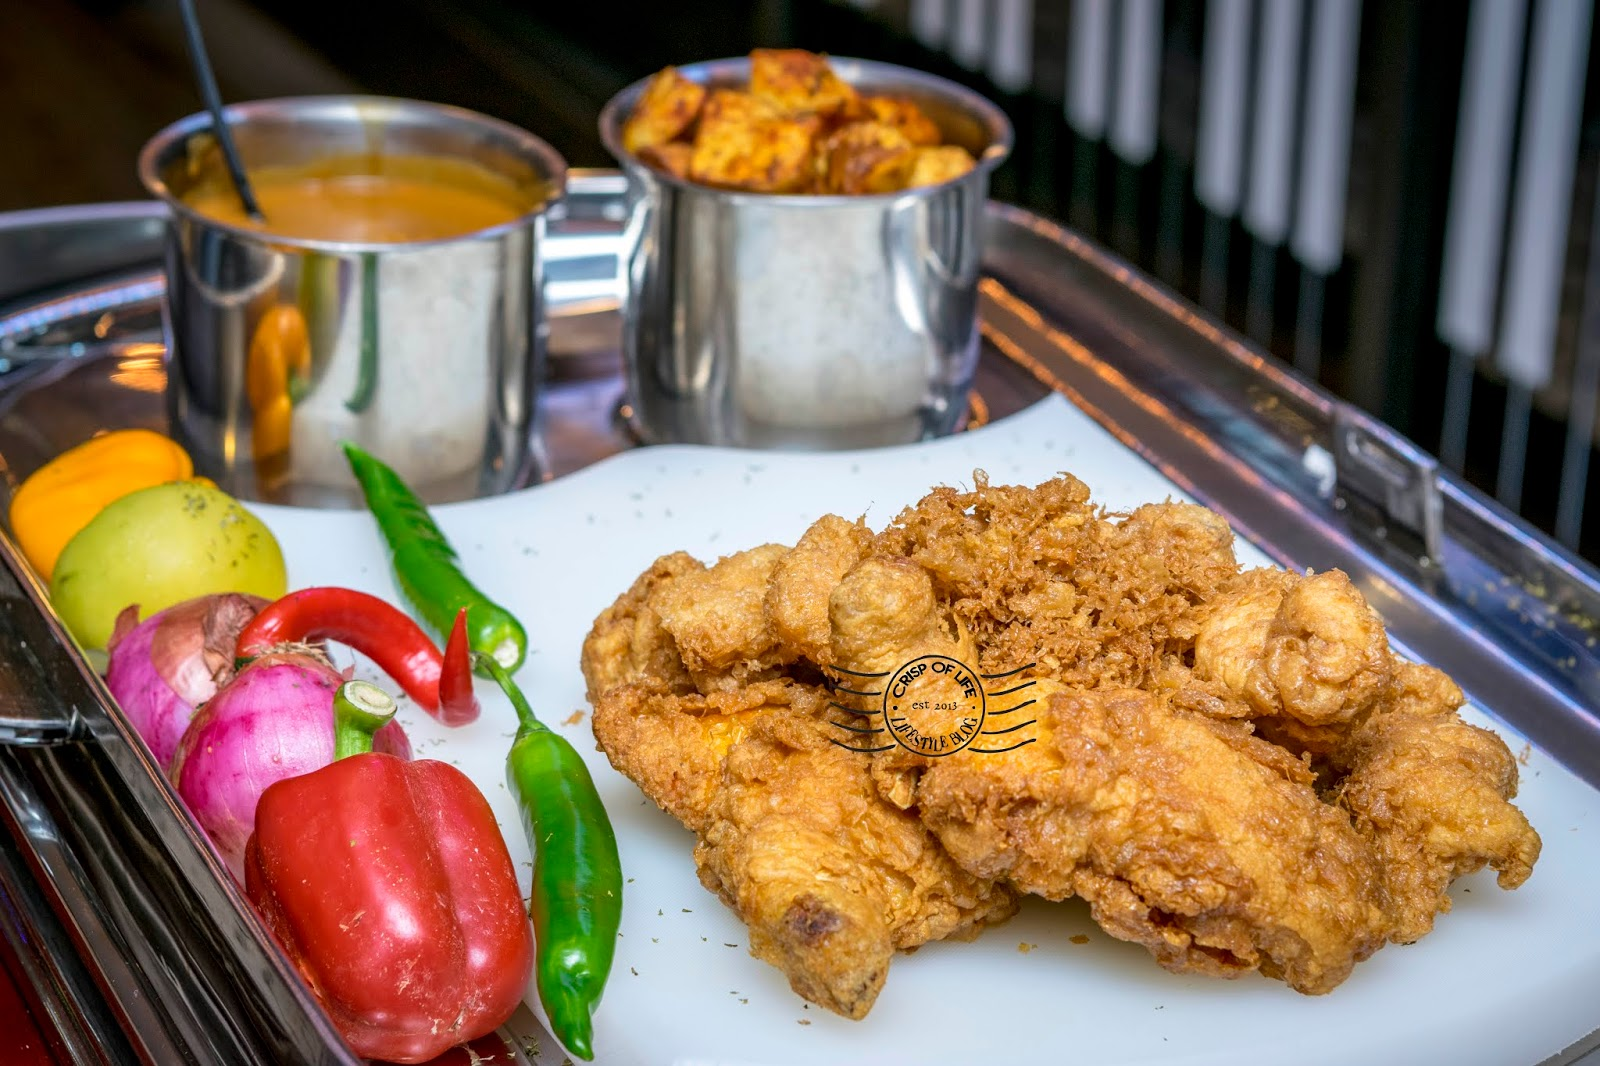 Kochabi Delights Buffet Dinner with Hainanese Cuisine @ Jazz Hotel Penang (Promotion - Buy 3 Free 1)